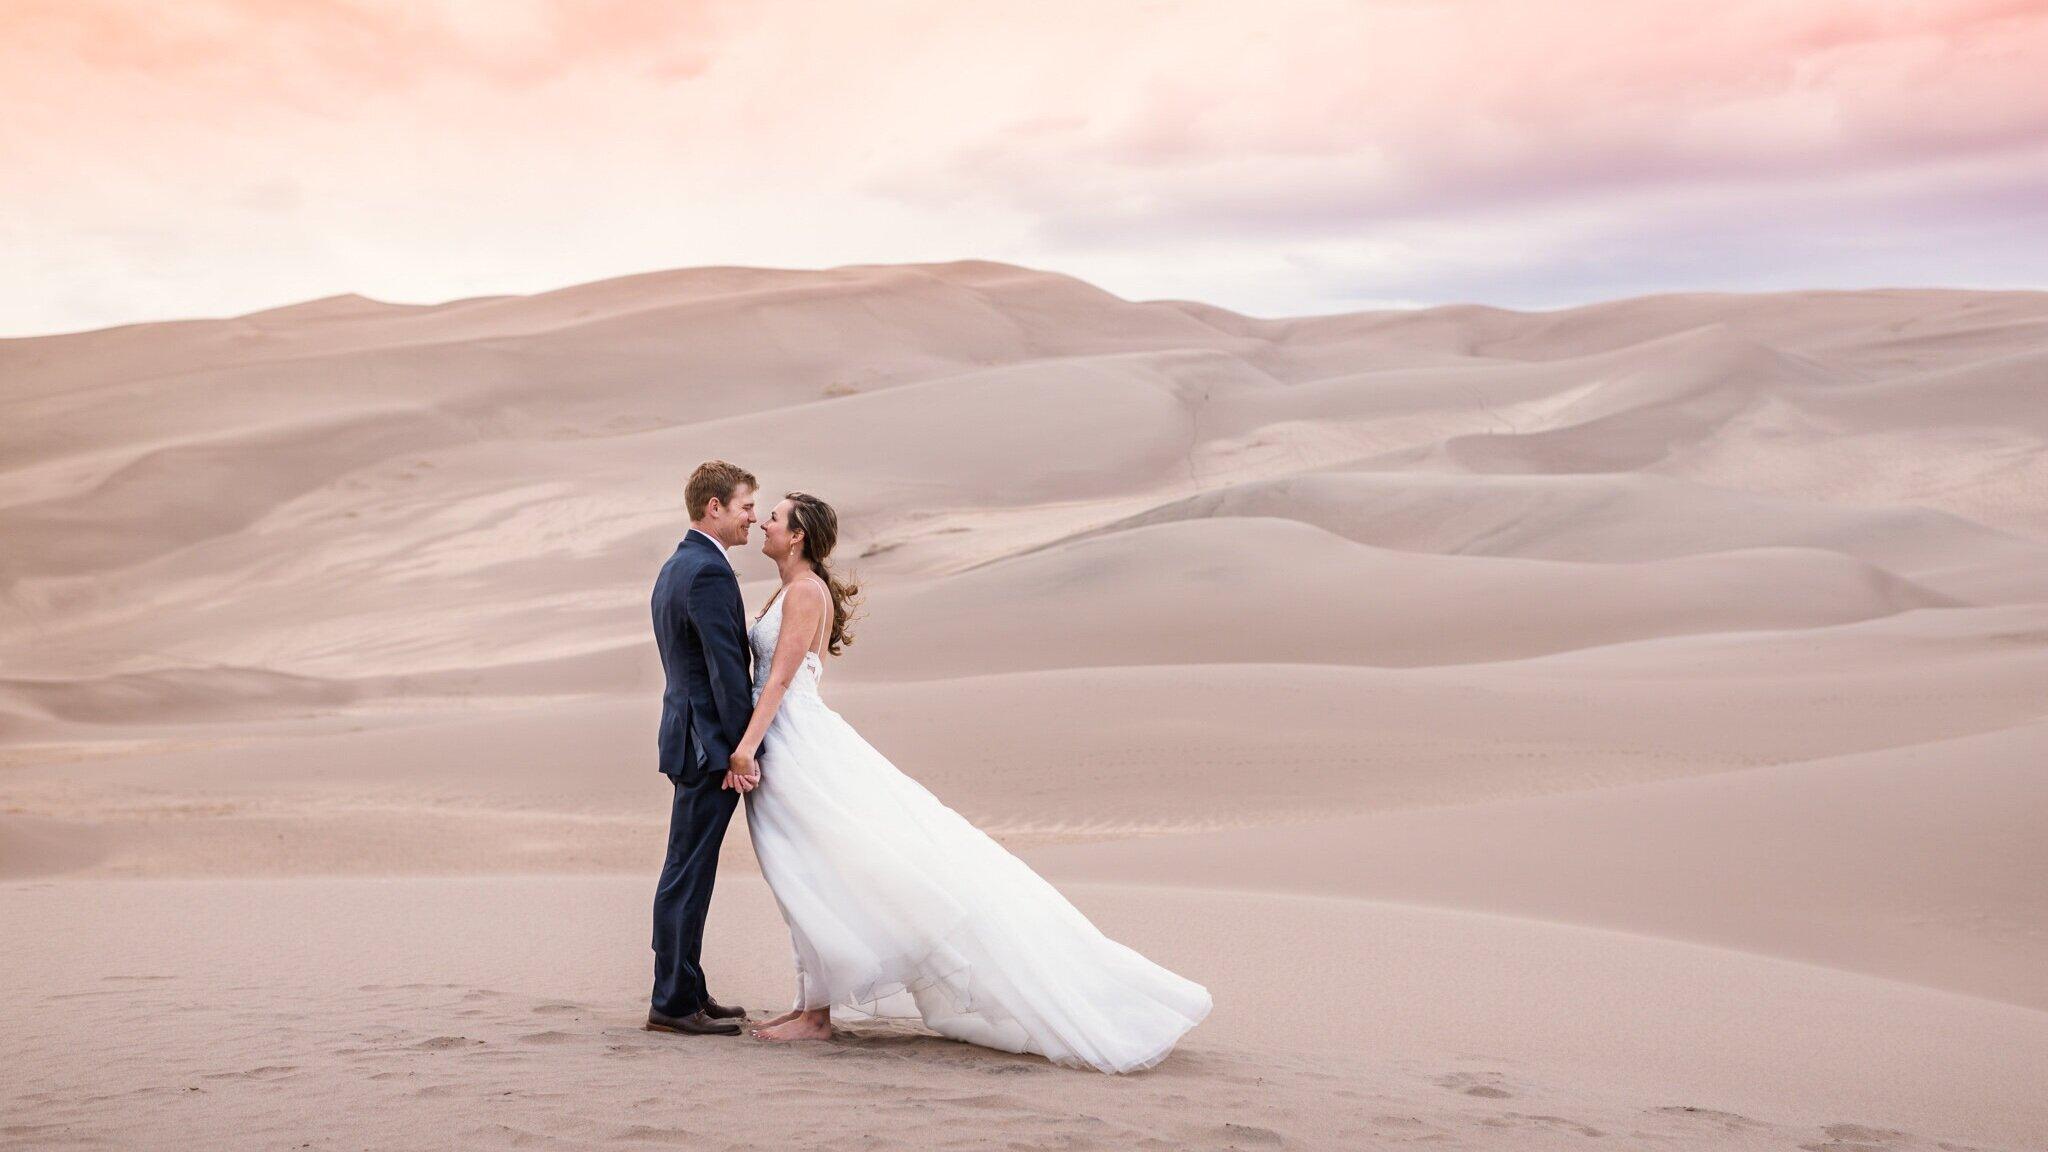 sand-dunes-elopement-photographer